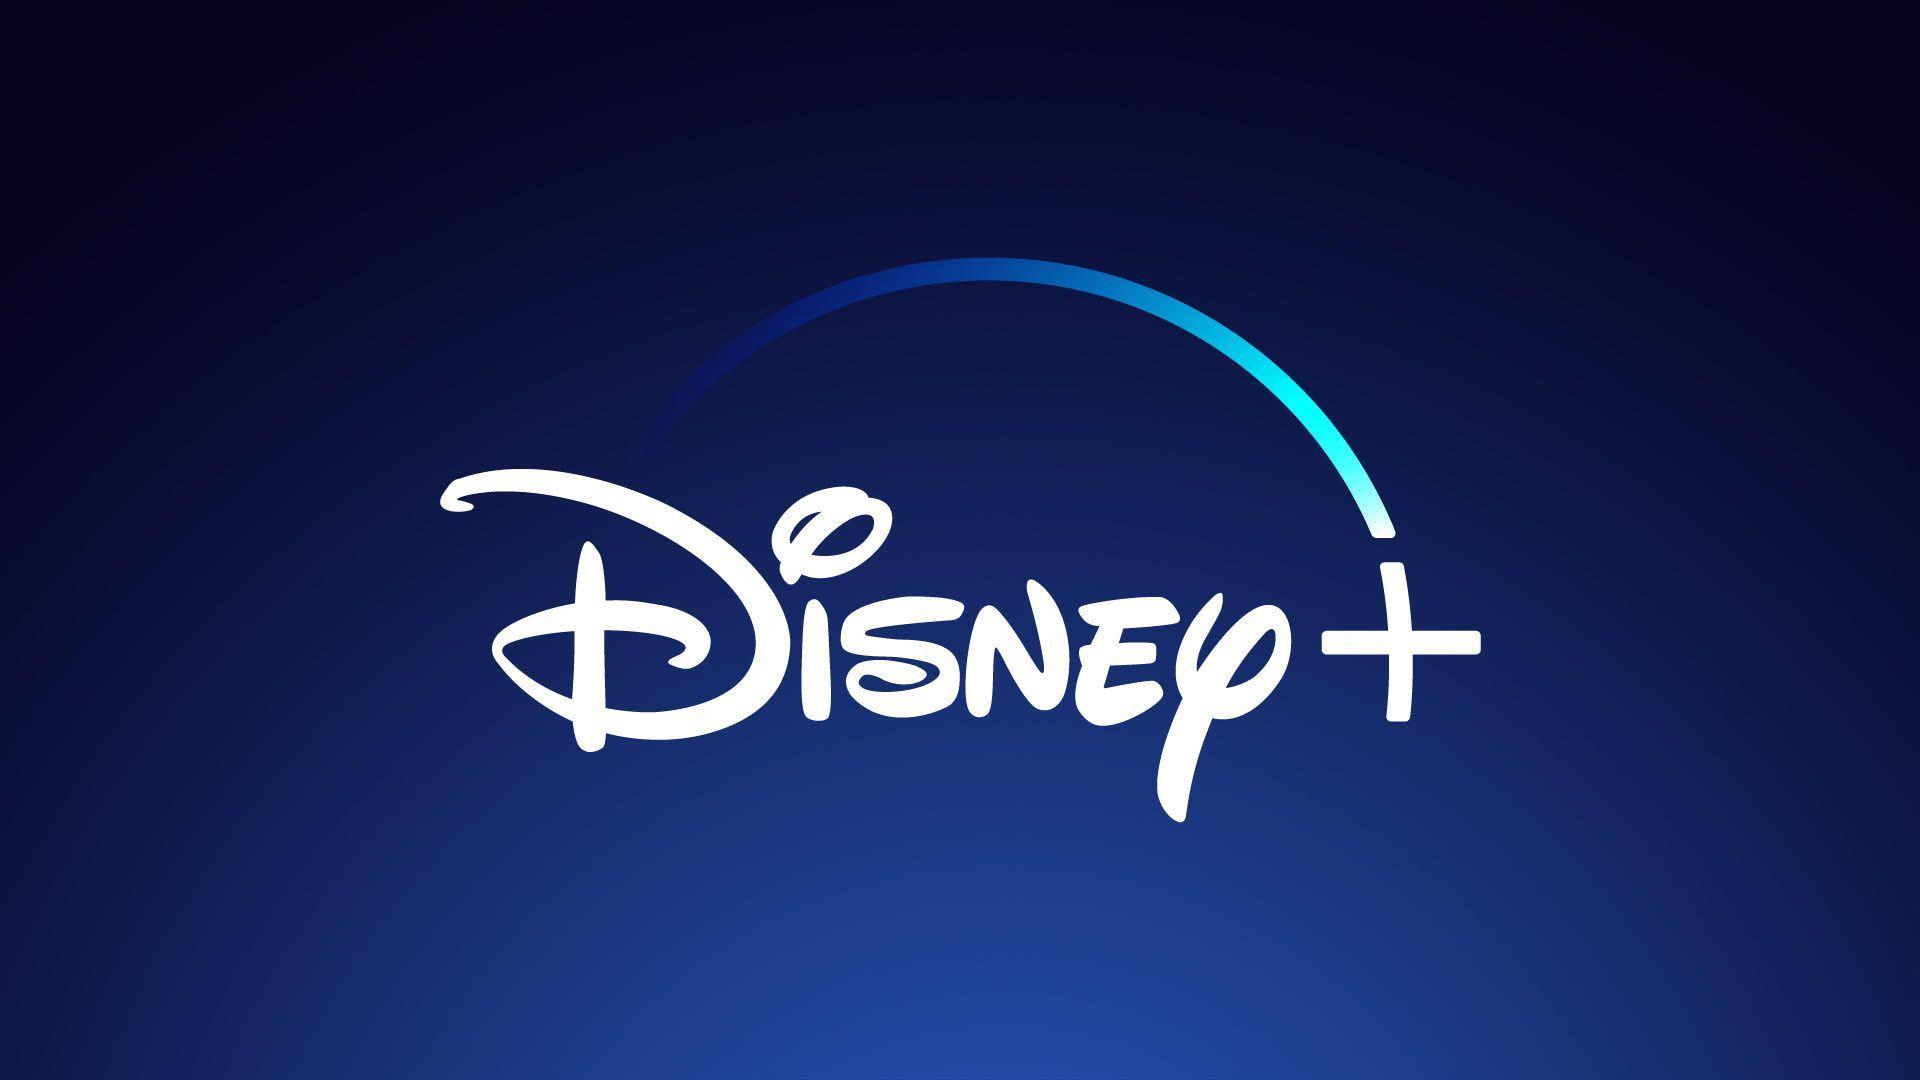 Disney strikes key deal with Amazon ahead of Disney+ launch